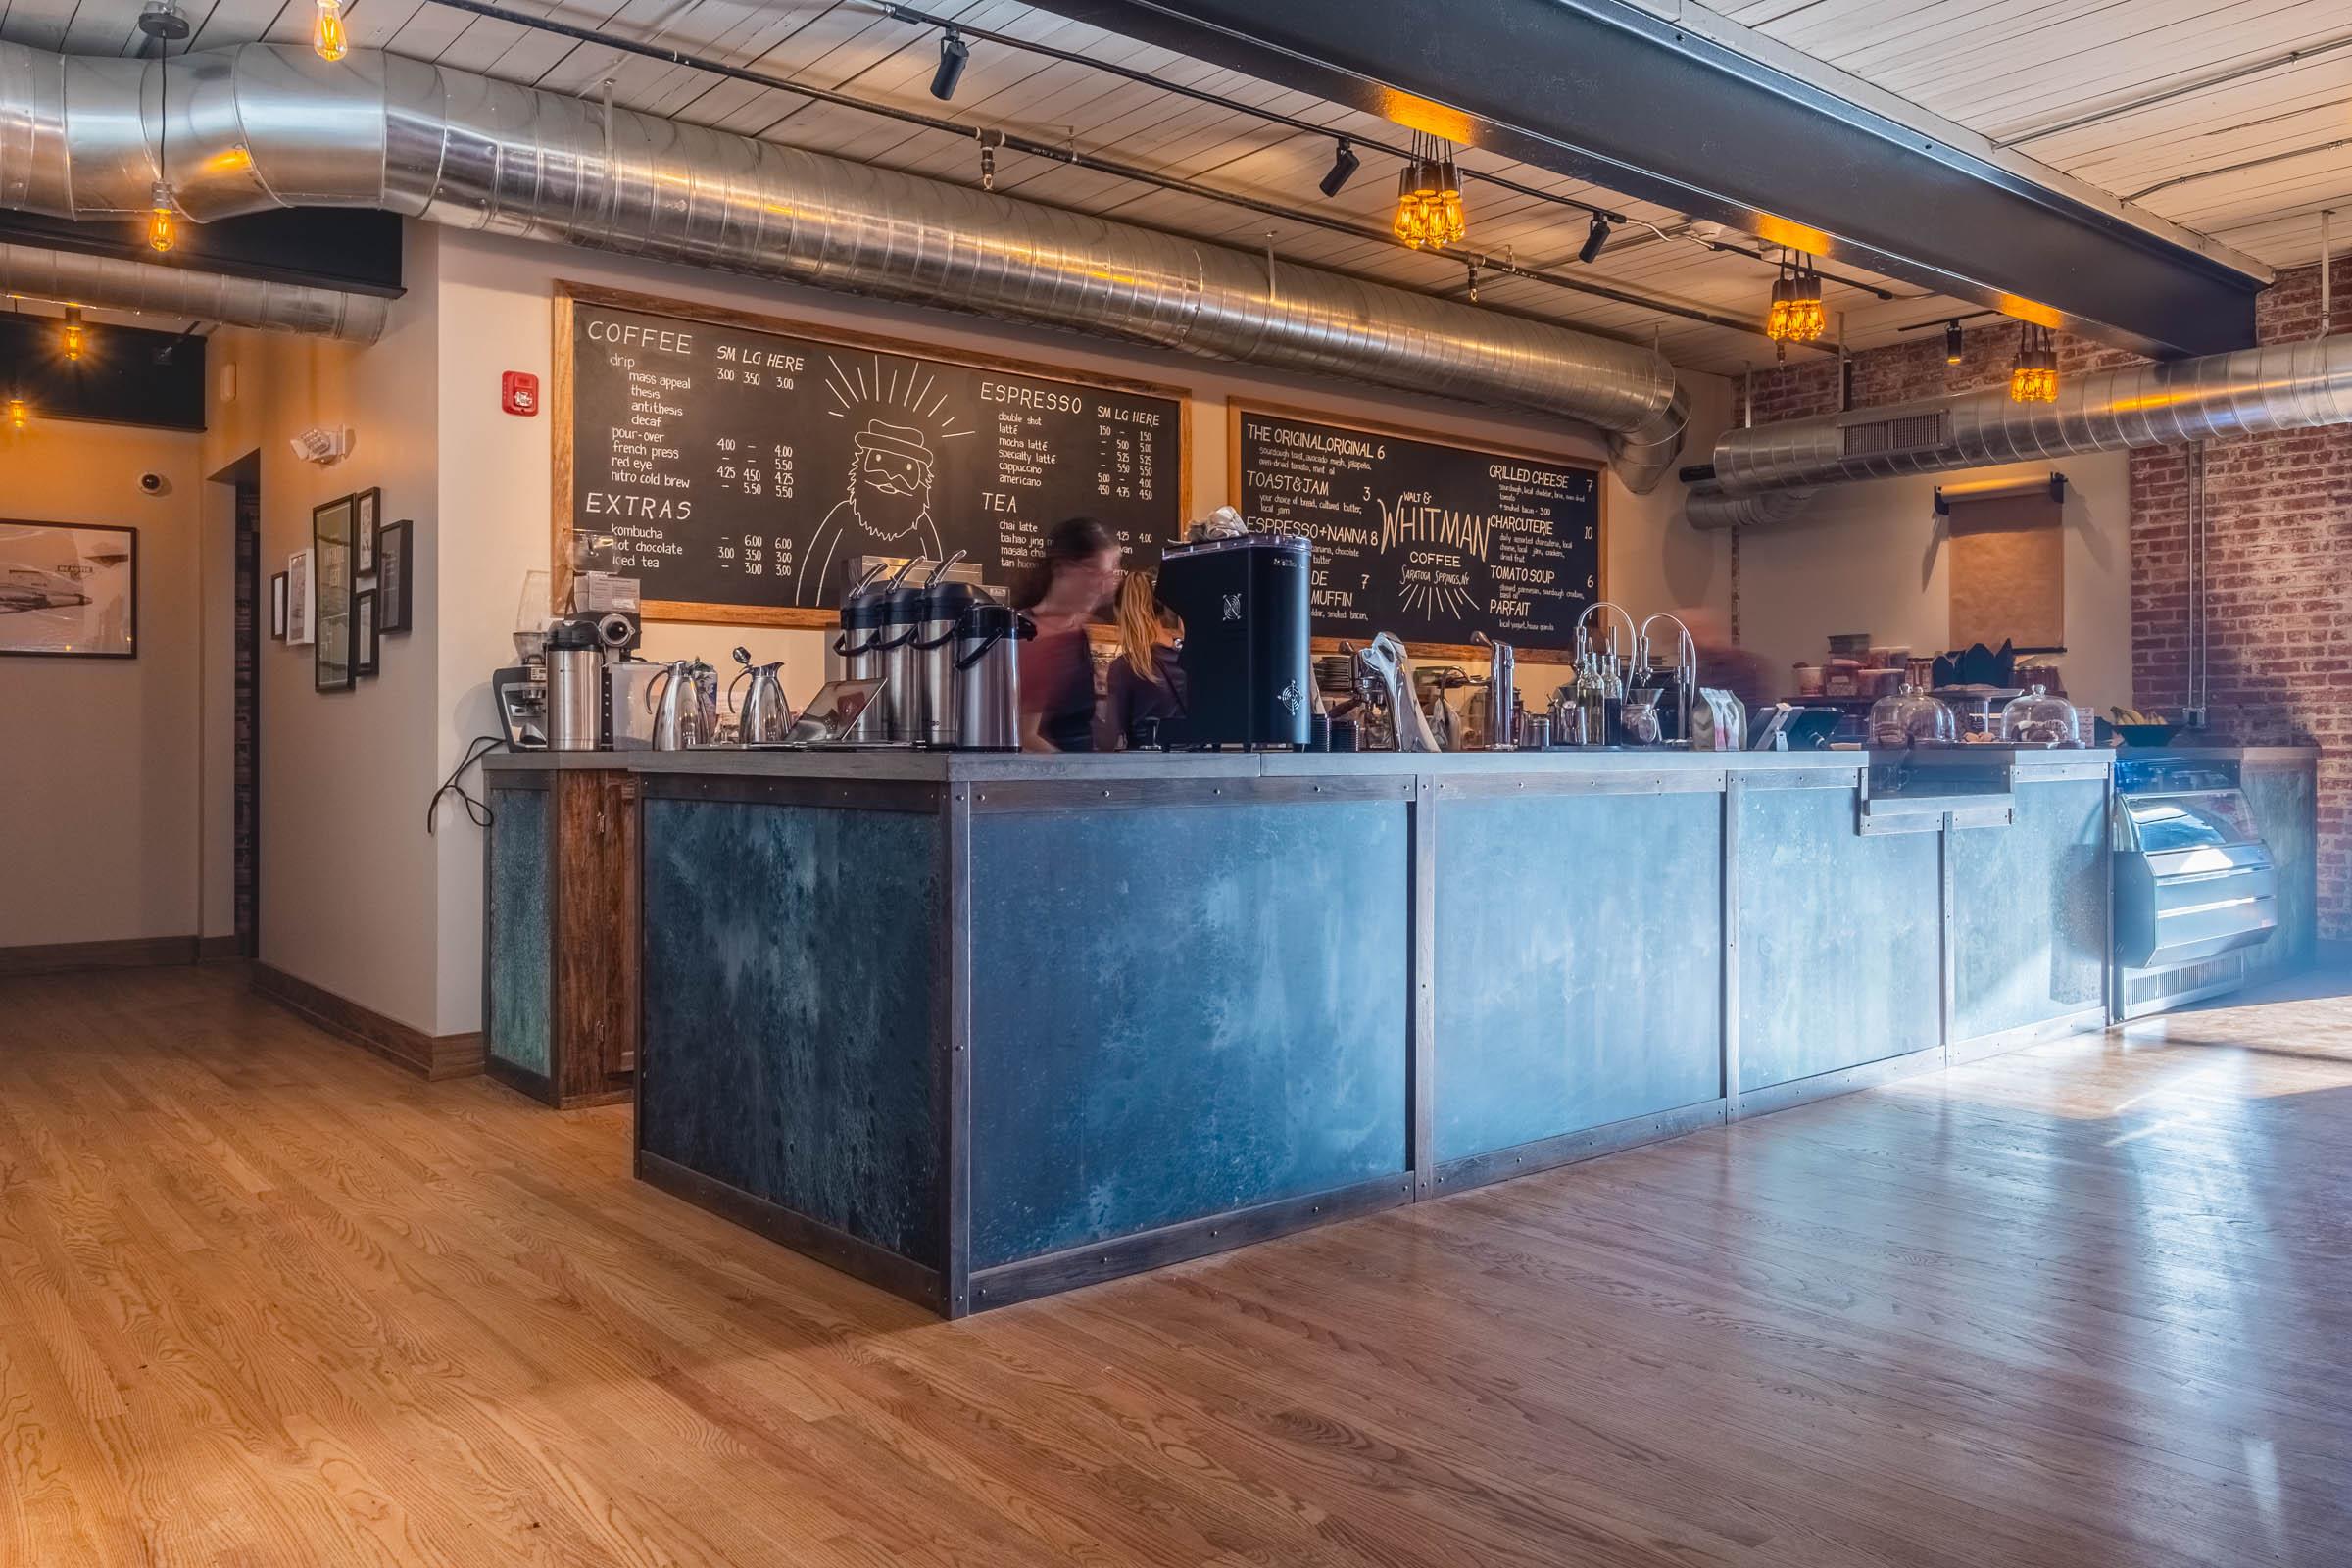 bonacio-walt-and-whitman-brewing-24